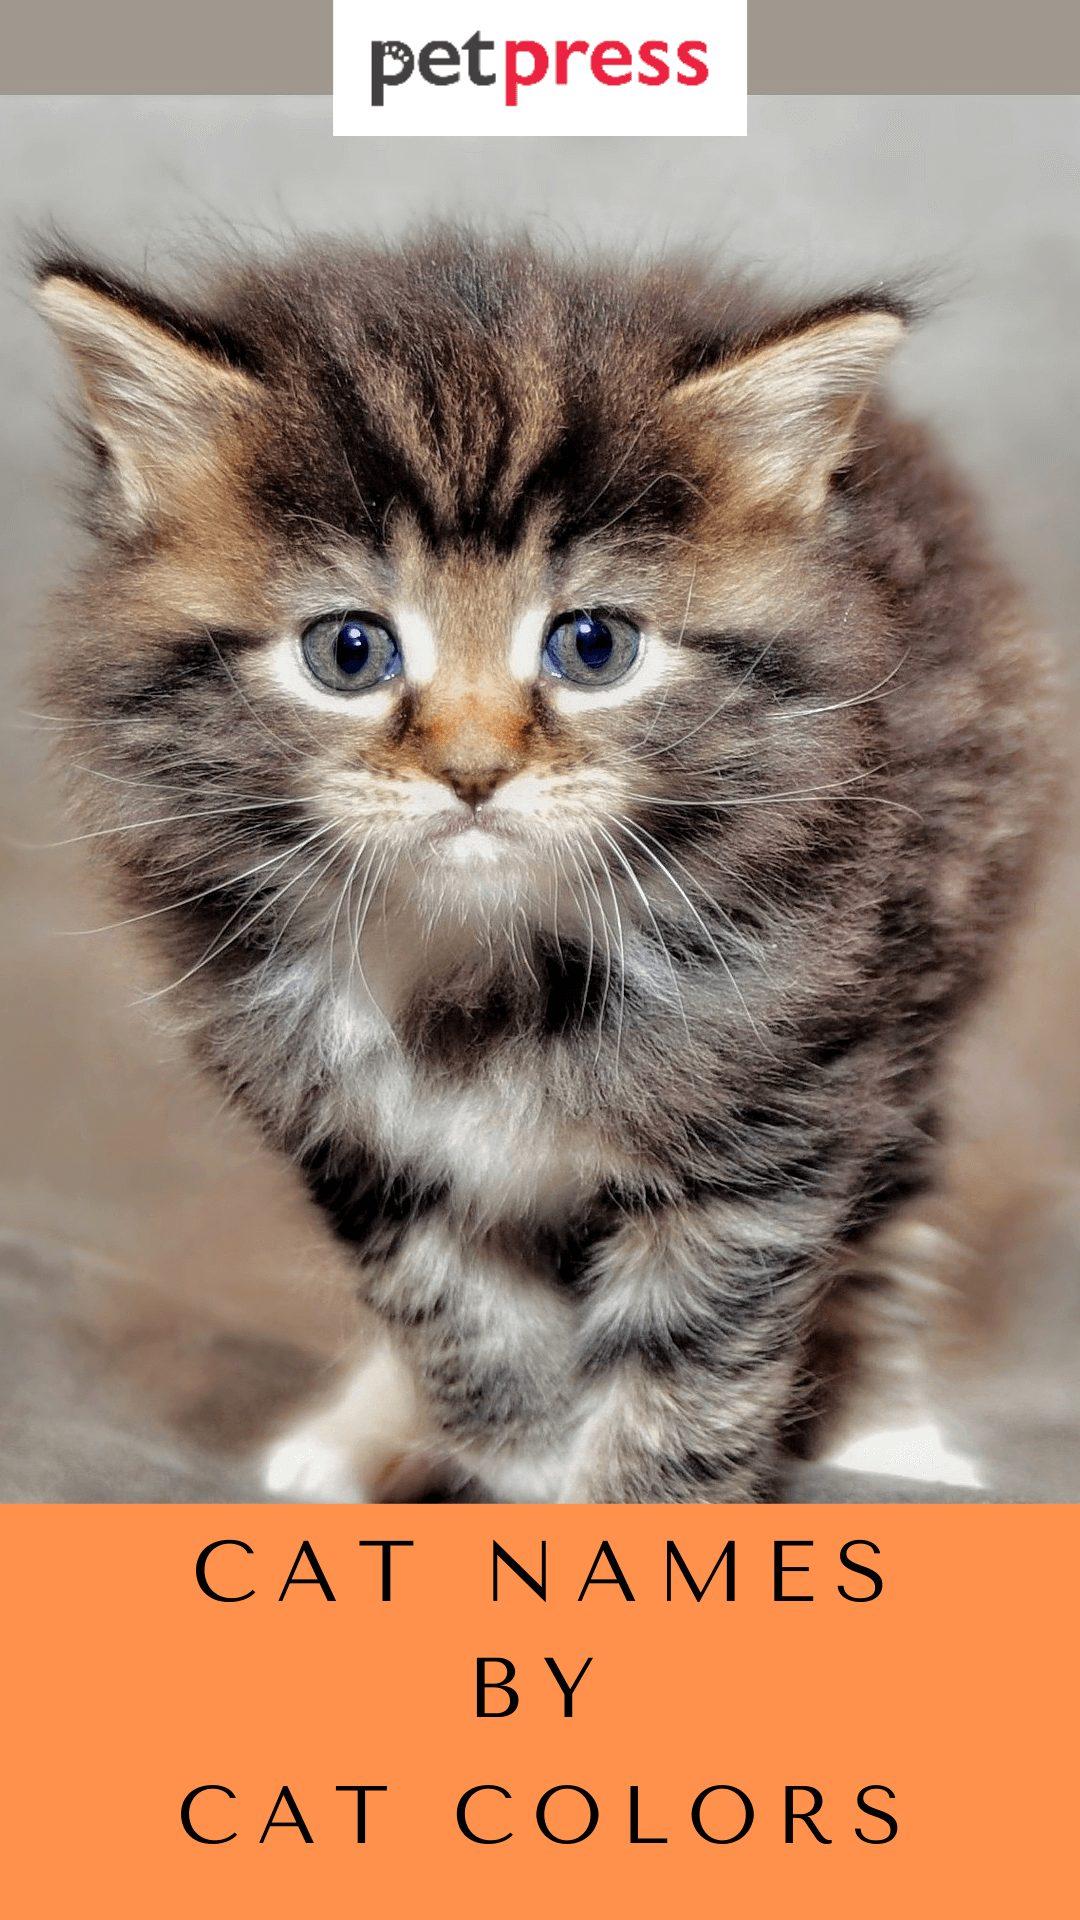 cat-names-by-cat-colors